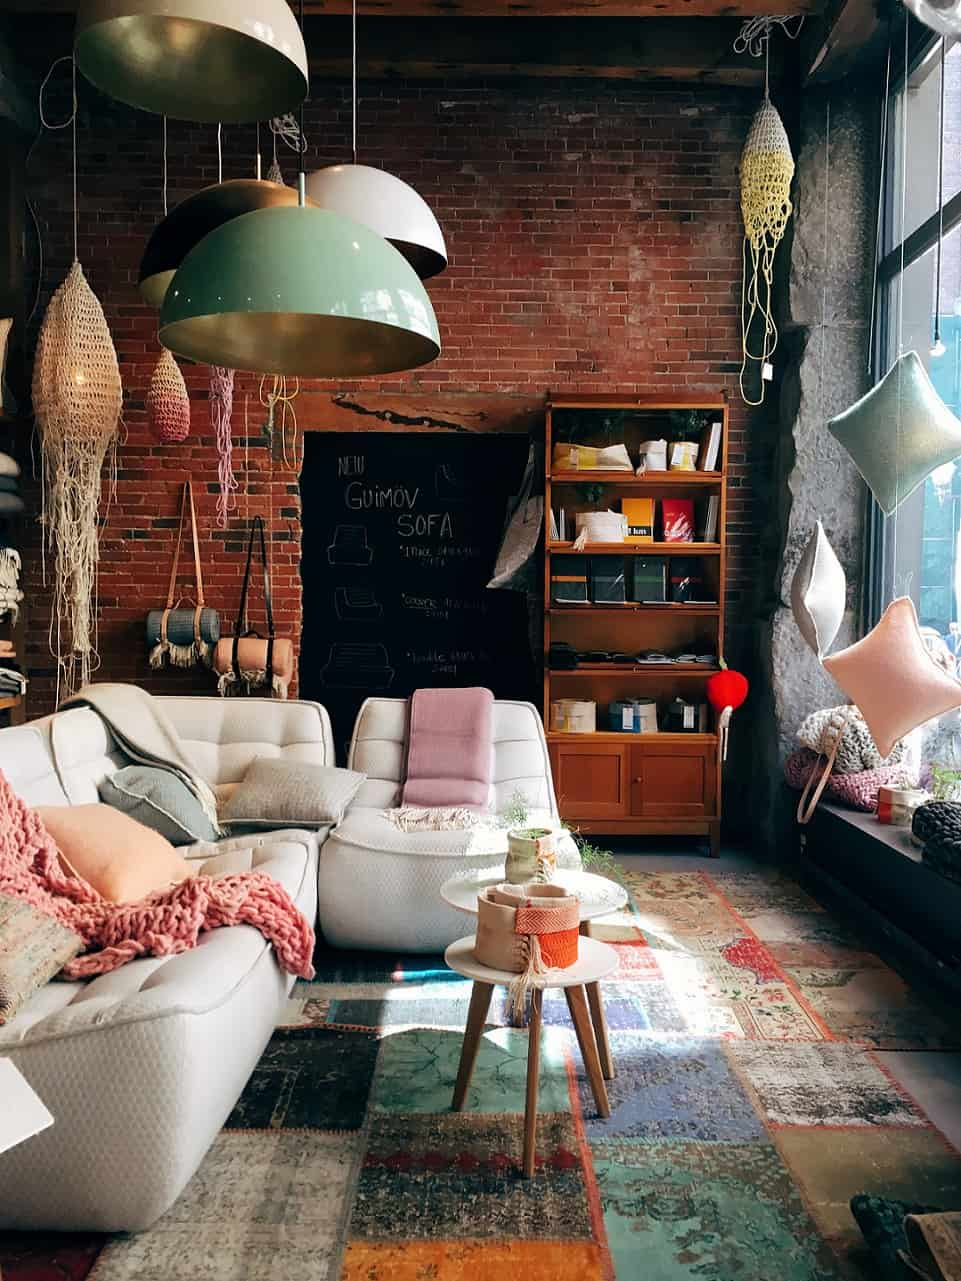 diseña tu mueble fabricar muebles bogota comprar muebles diseño bogota colombia